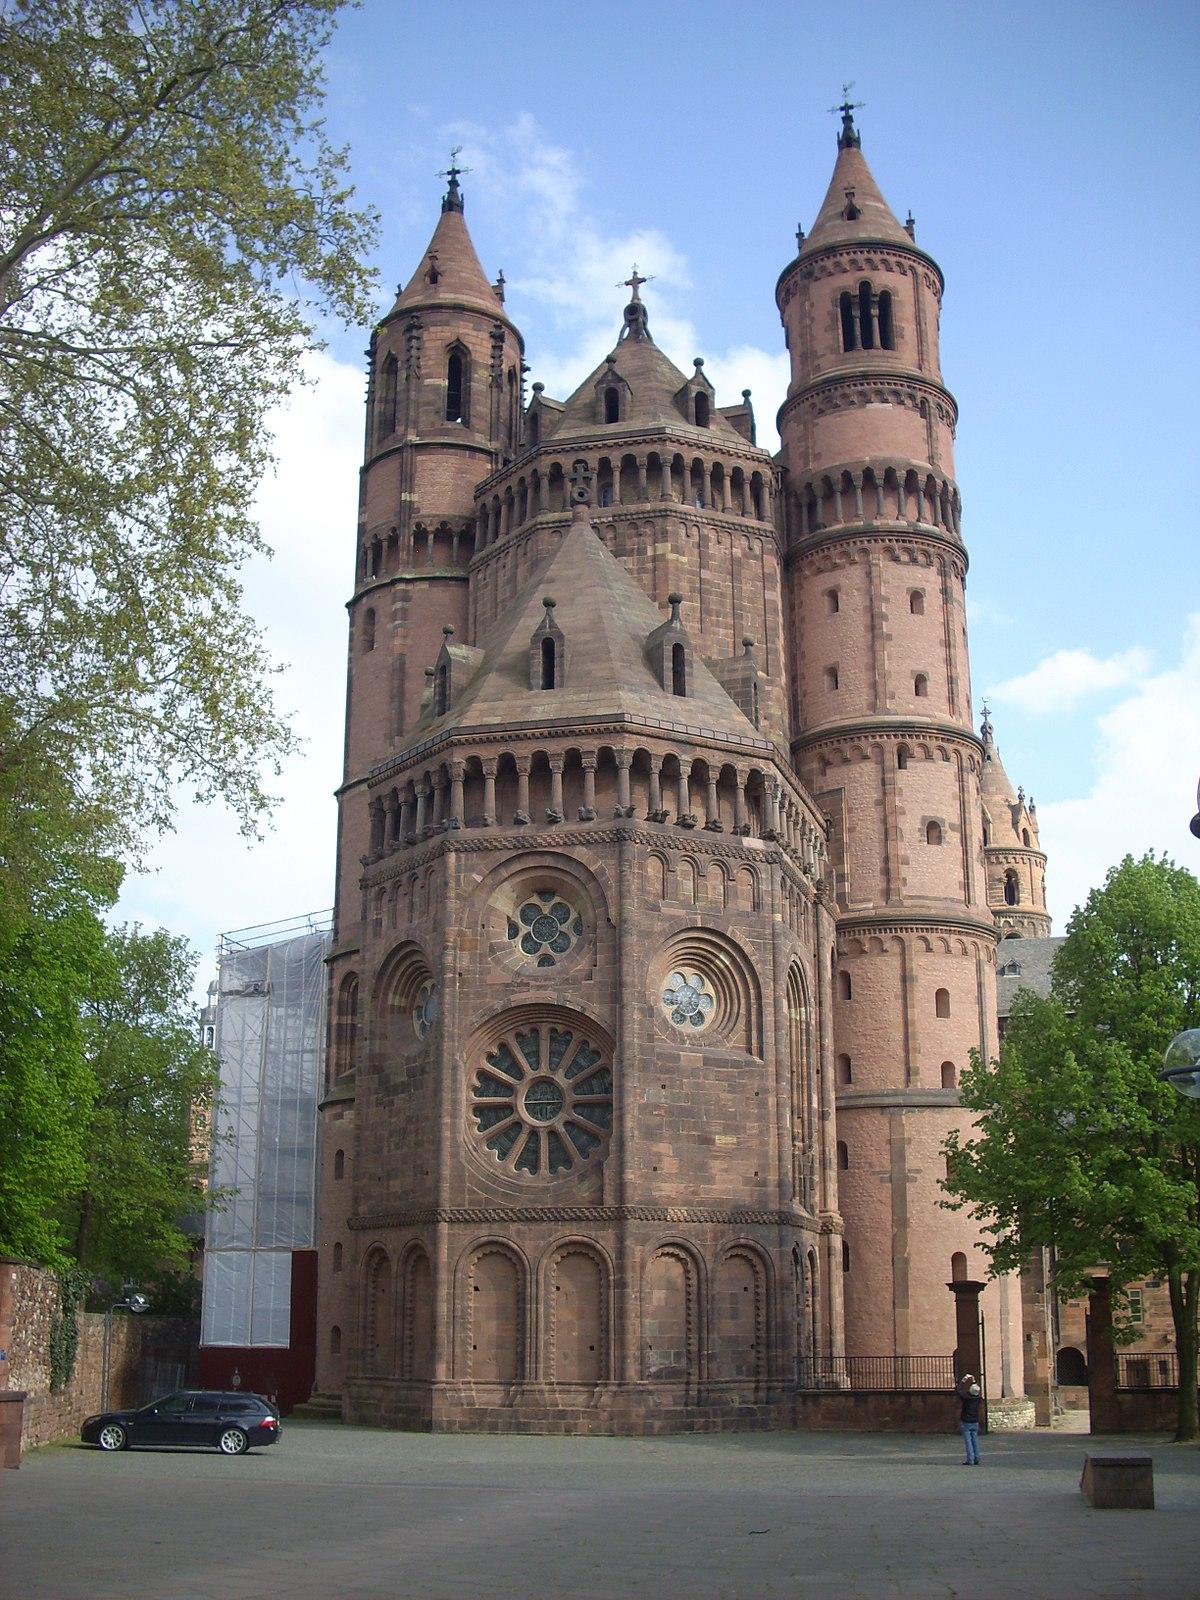 Catedral de worms wikipedia la enciclopedia libre for Architektur romantik